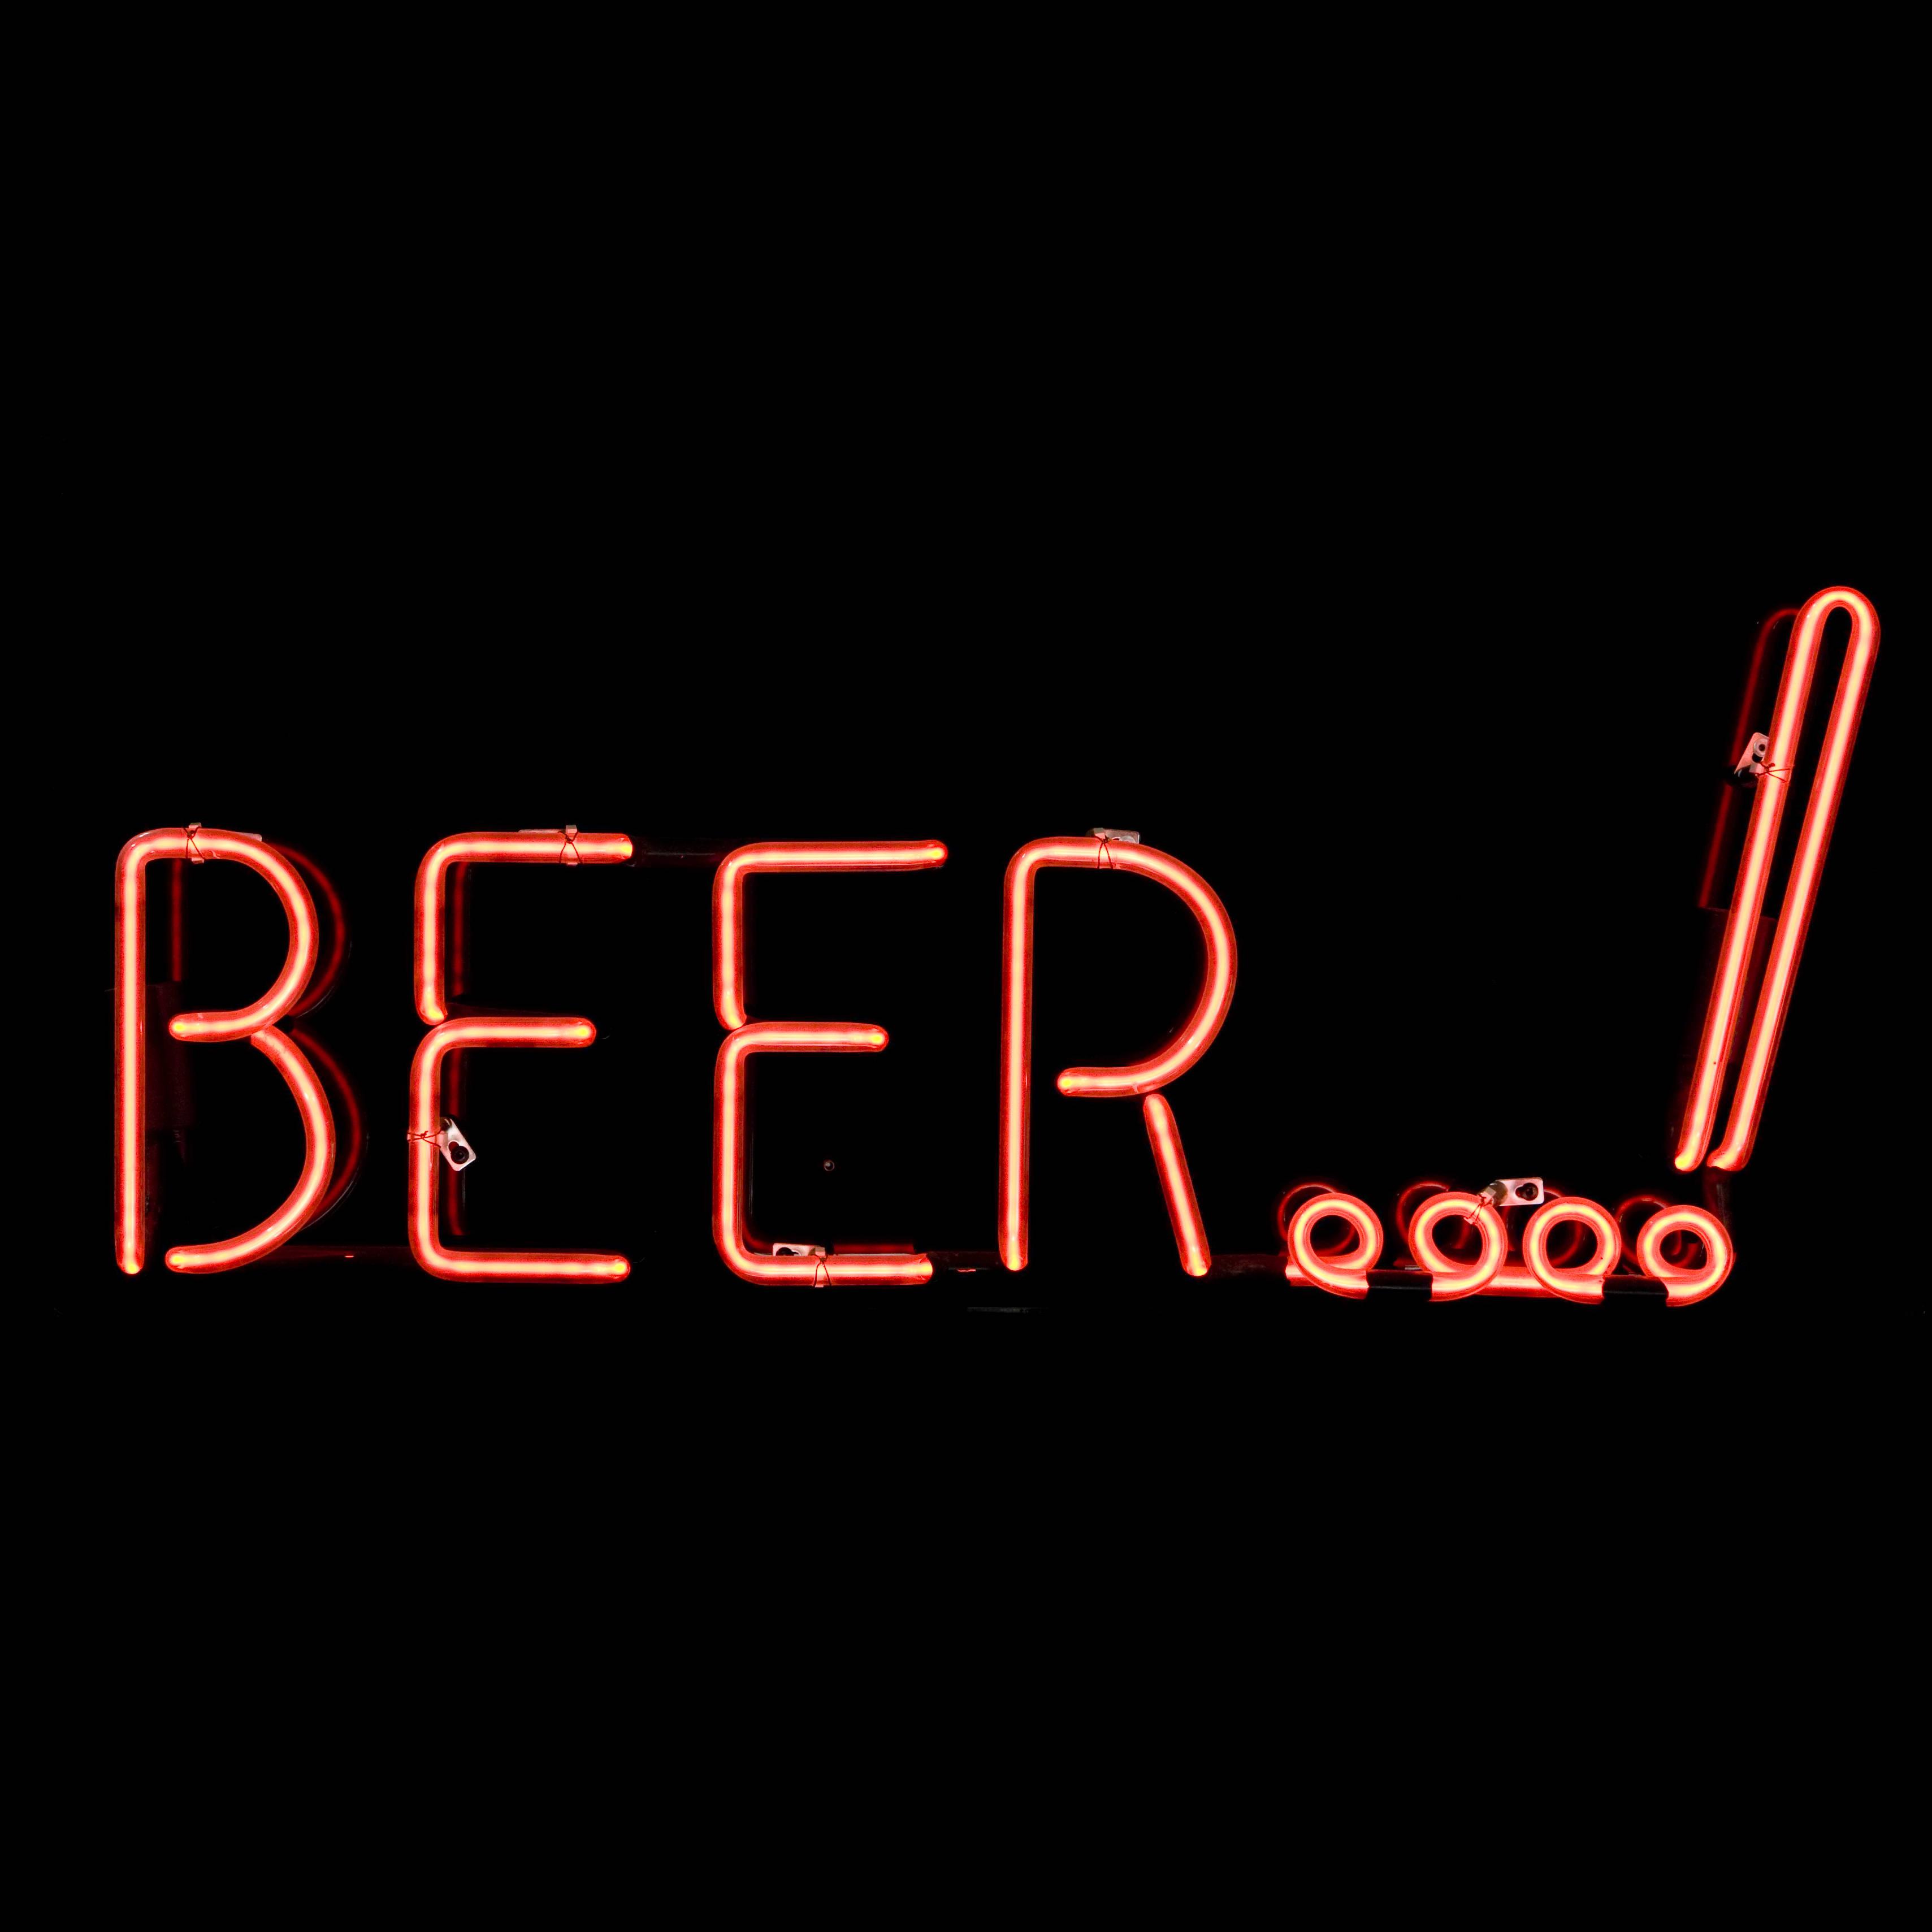 BEER…! / NEON SIGN | Air Designs